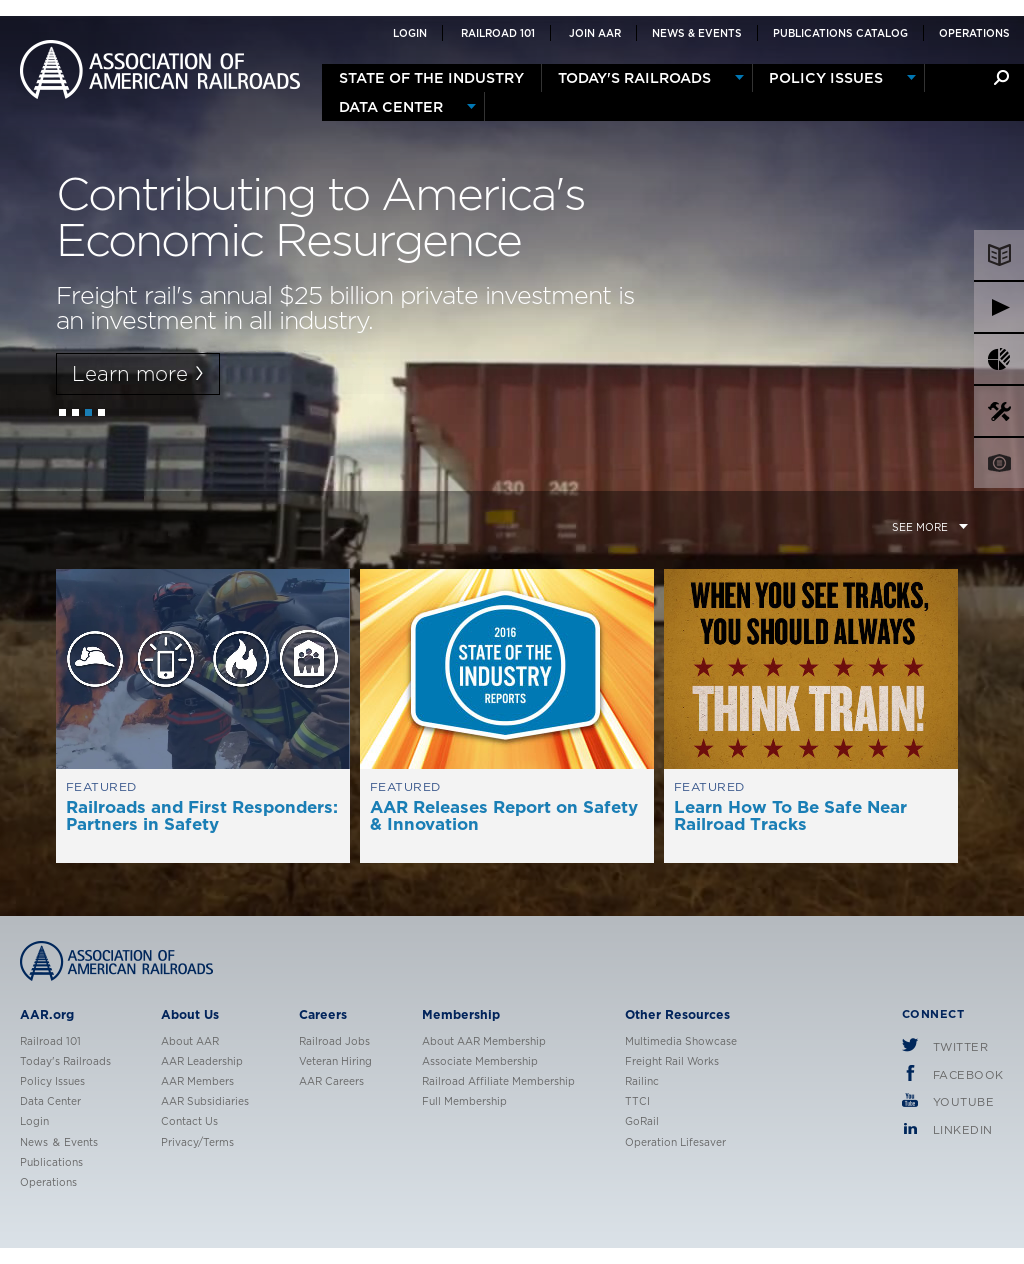 Association of American Railroads Competitors, Revenue and